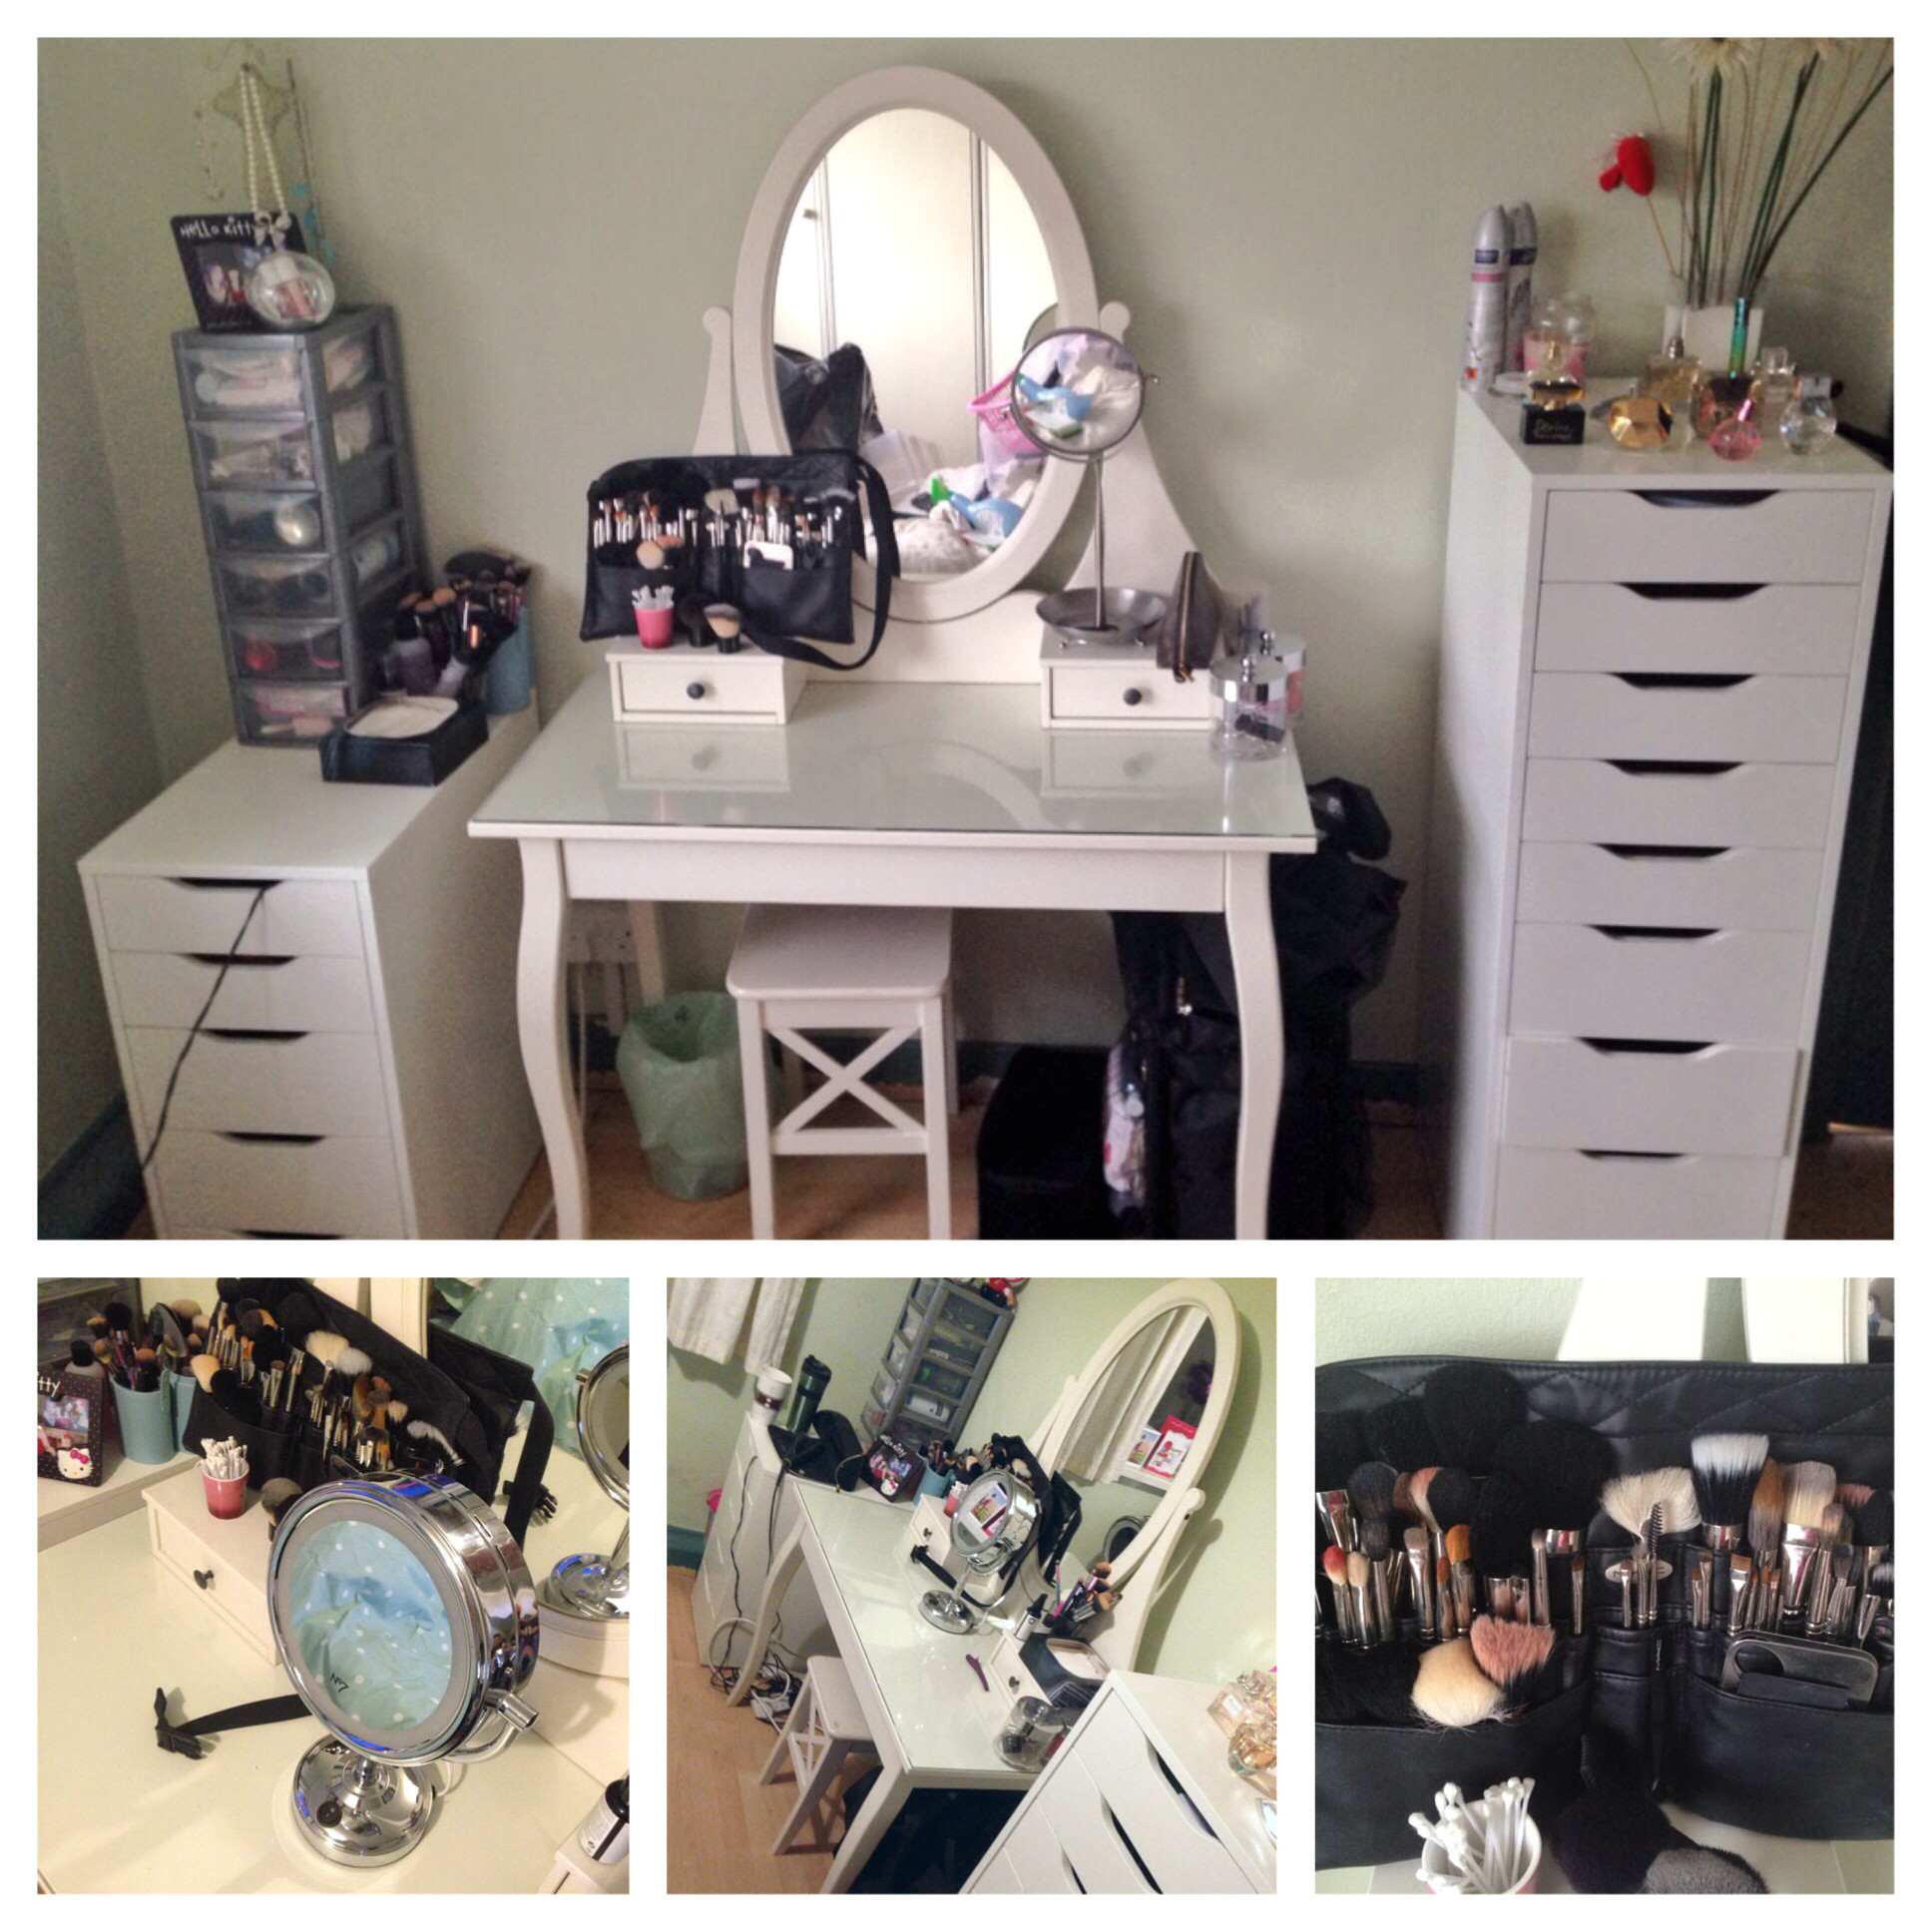 ikea alex drawer organizer ikea makeup organizer ikea alex dupe